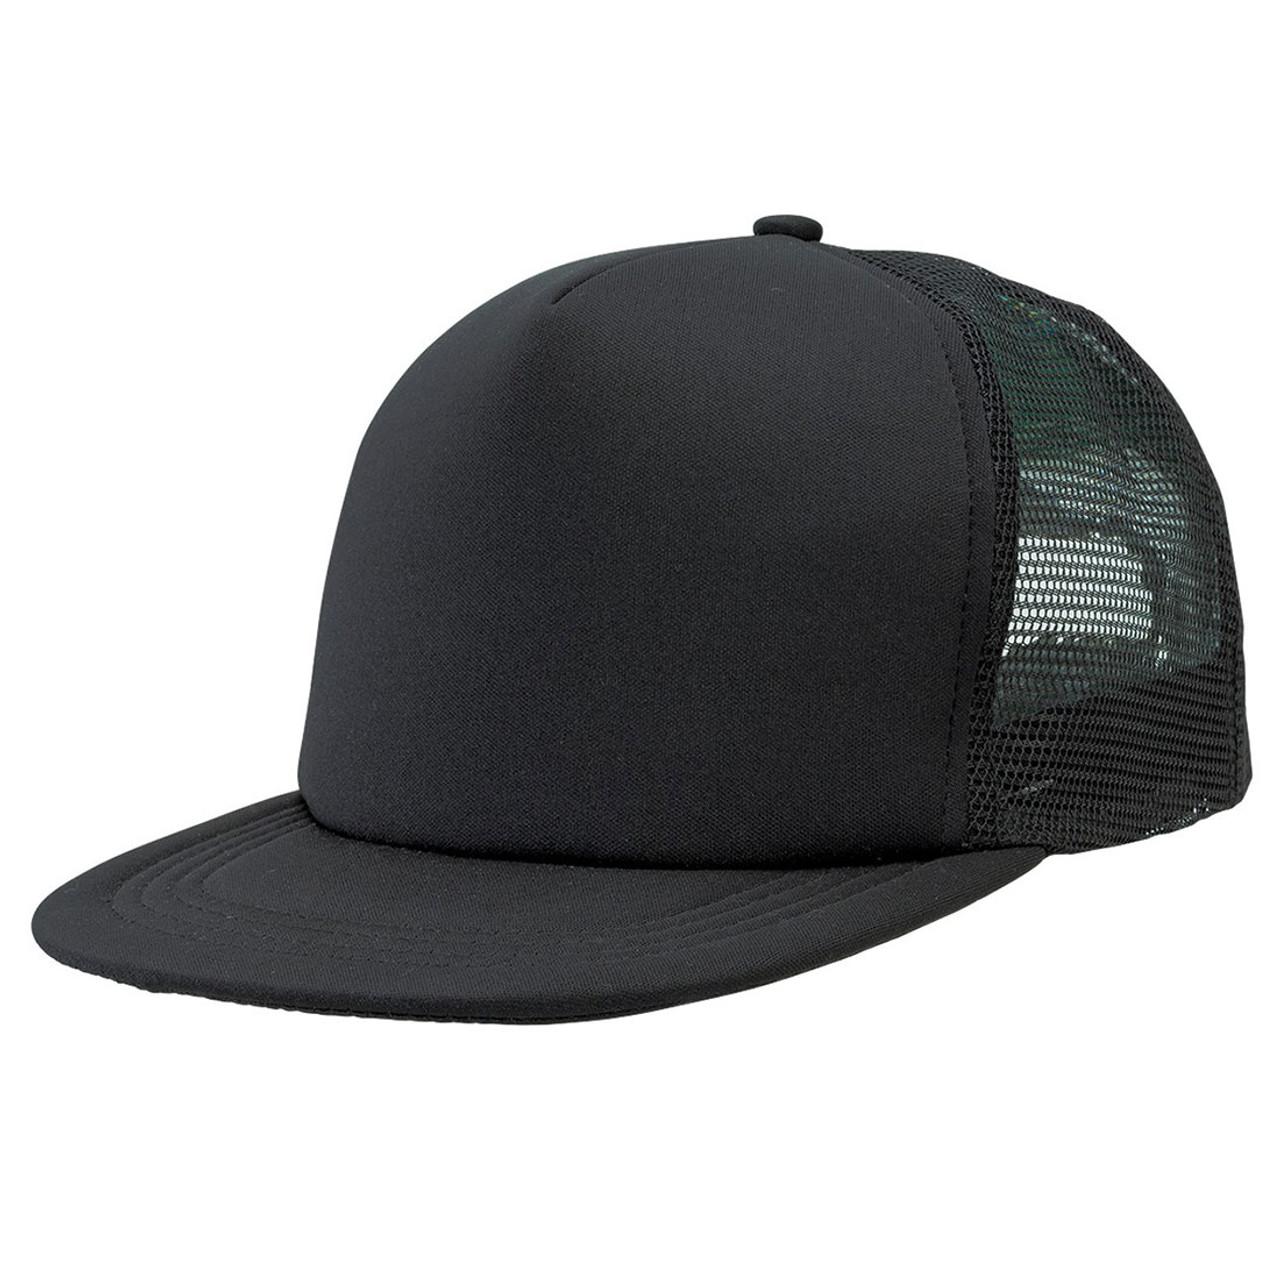 3cc9a68bc96e26 wholesale plain flat peak trucker cap | blank clothing & hats online